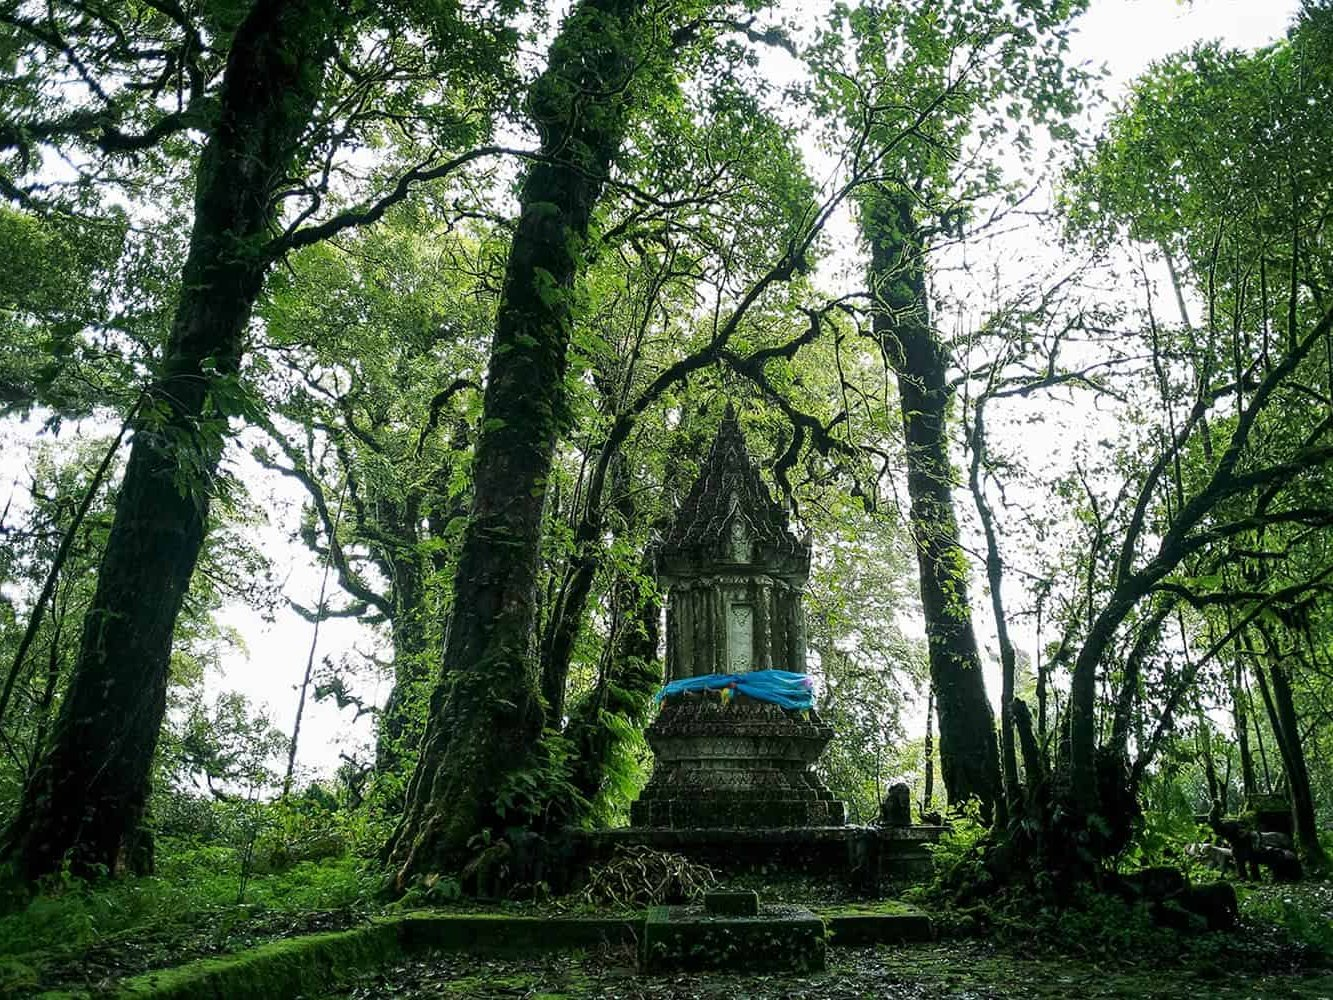 vietnam photographer mahout family binhdang 9